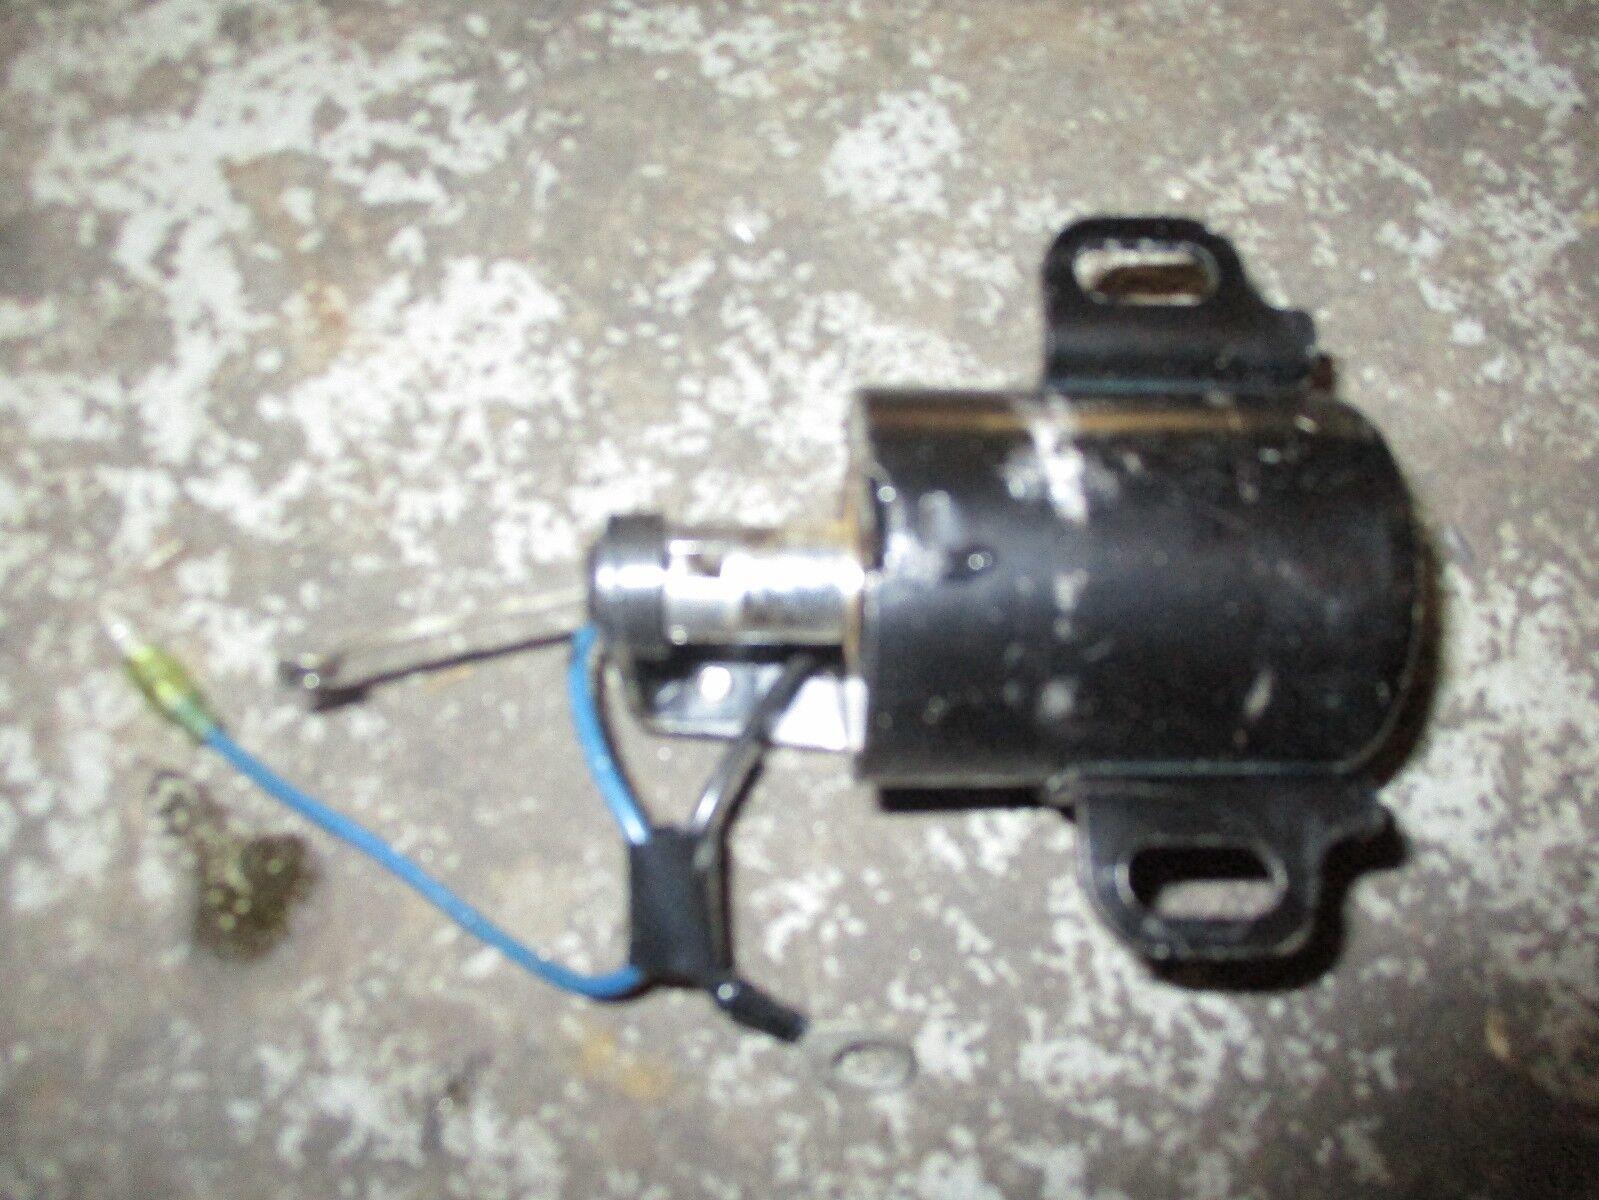 115TJRV 115TLRV Trim Motor Power Starter Unit fits 1997 Yamaha 115HP C115TLRV